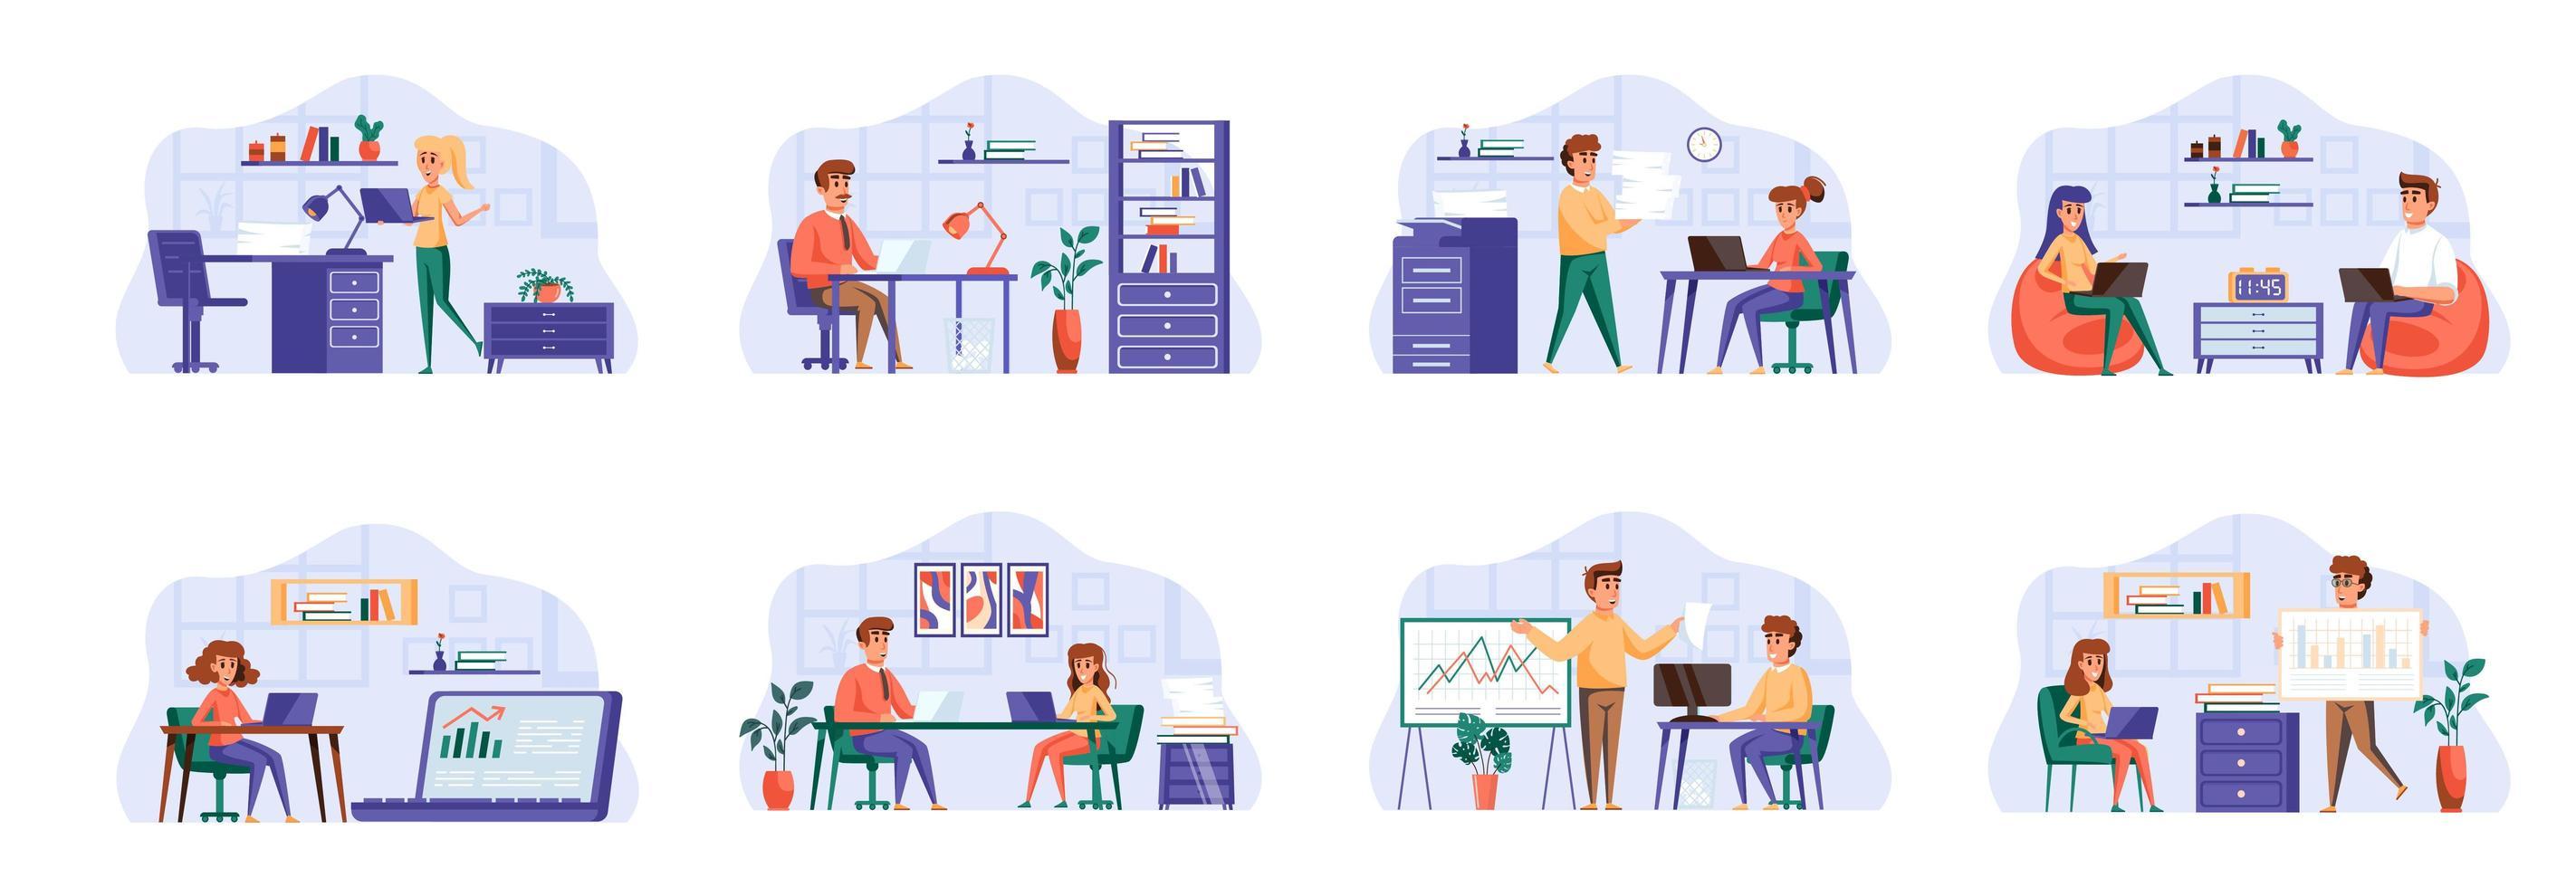 Office-Management-Szenen werden mit Personencharakteren gebündelt. vektor